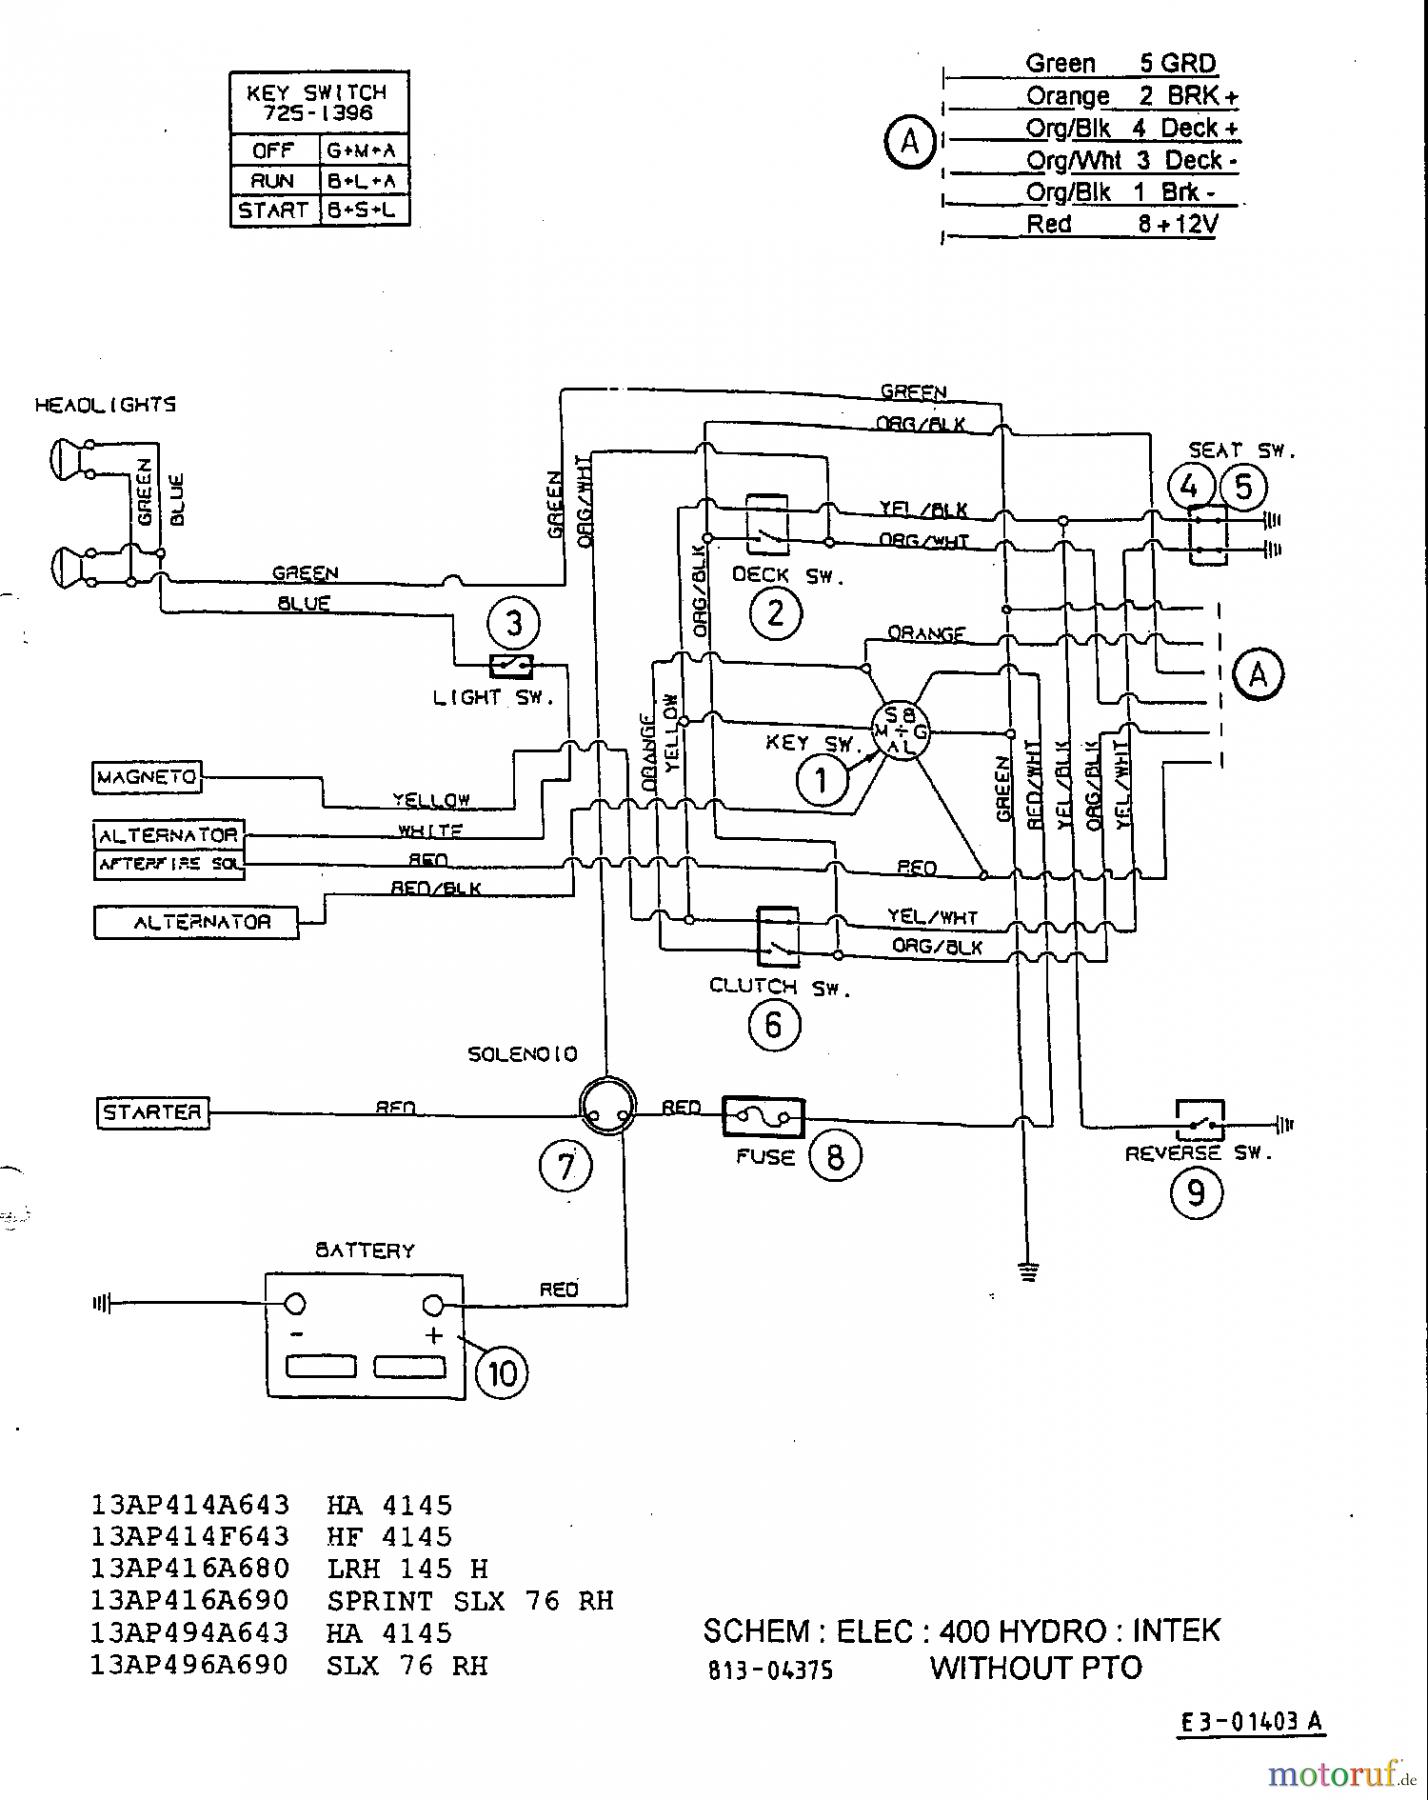 Mtd Lawn Mower Wiring Diagram | Wiring Diagram - Riding Mower Wiring Diagram